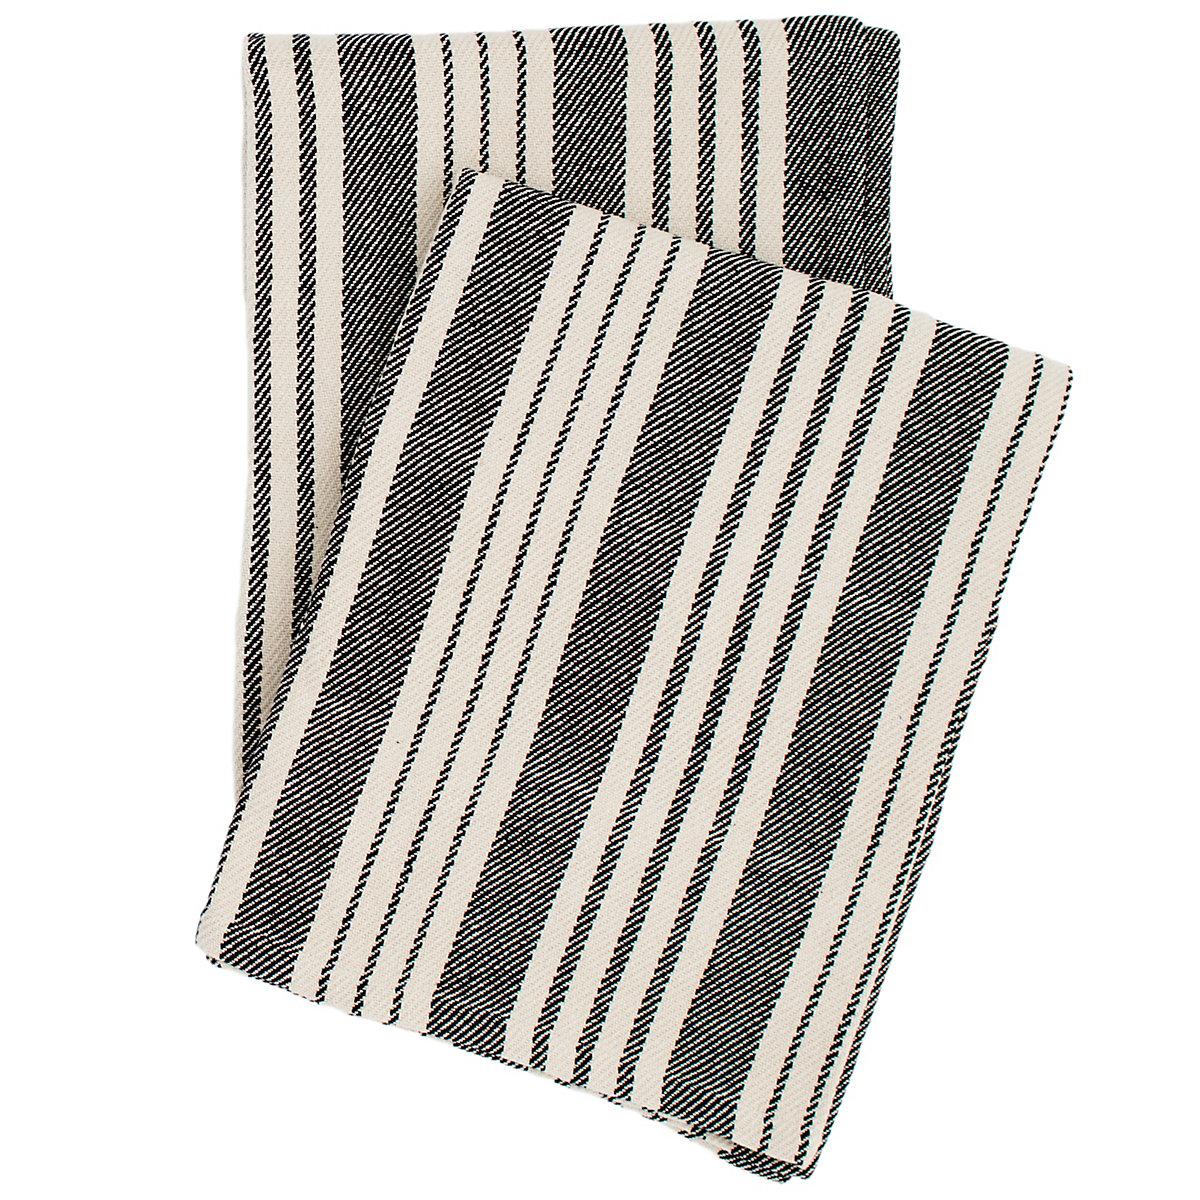 Birmingham black woven cotton throw dash albert for Dash and albert blankets